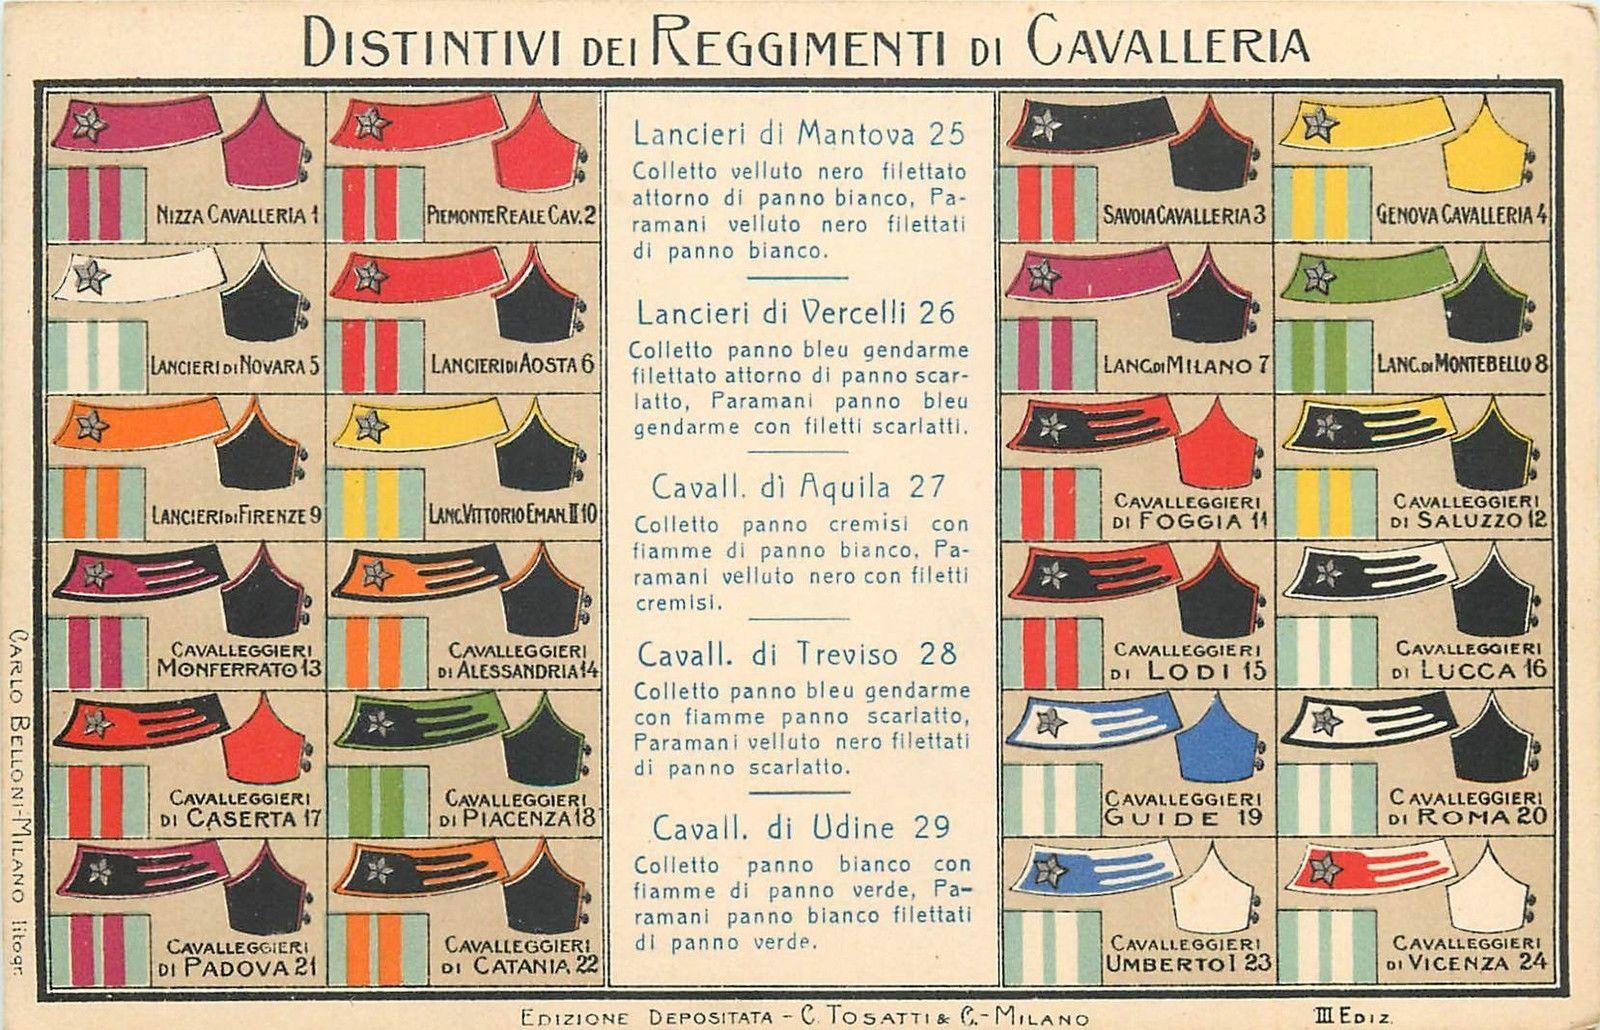 Italian Cavalry Regiment Military Decorations Distintivi Reggimenti ... 71e1dd032b7f